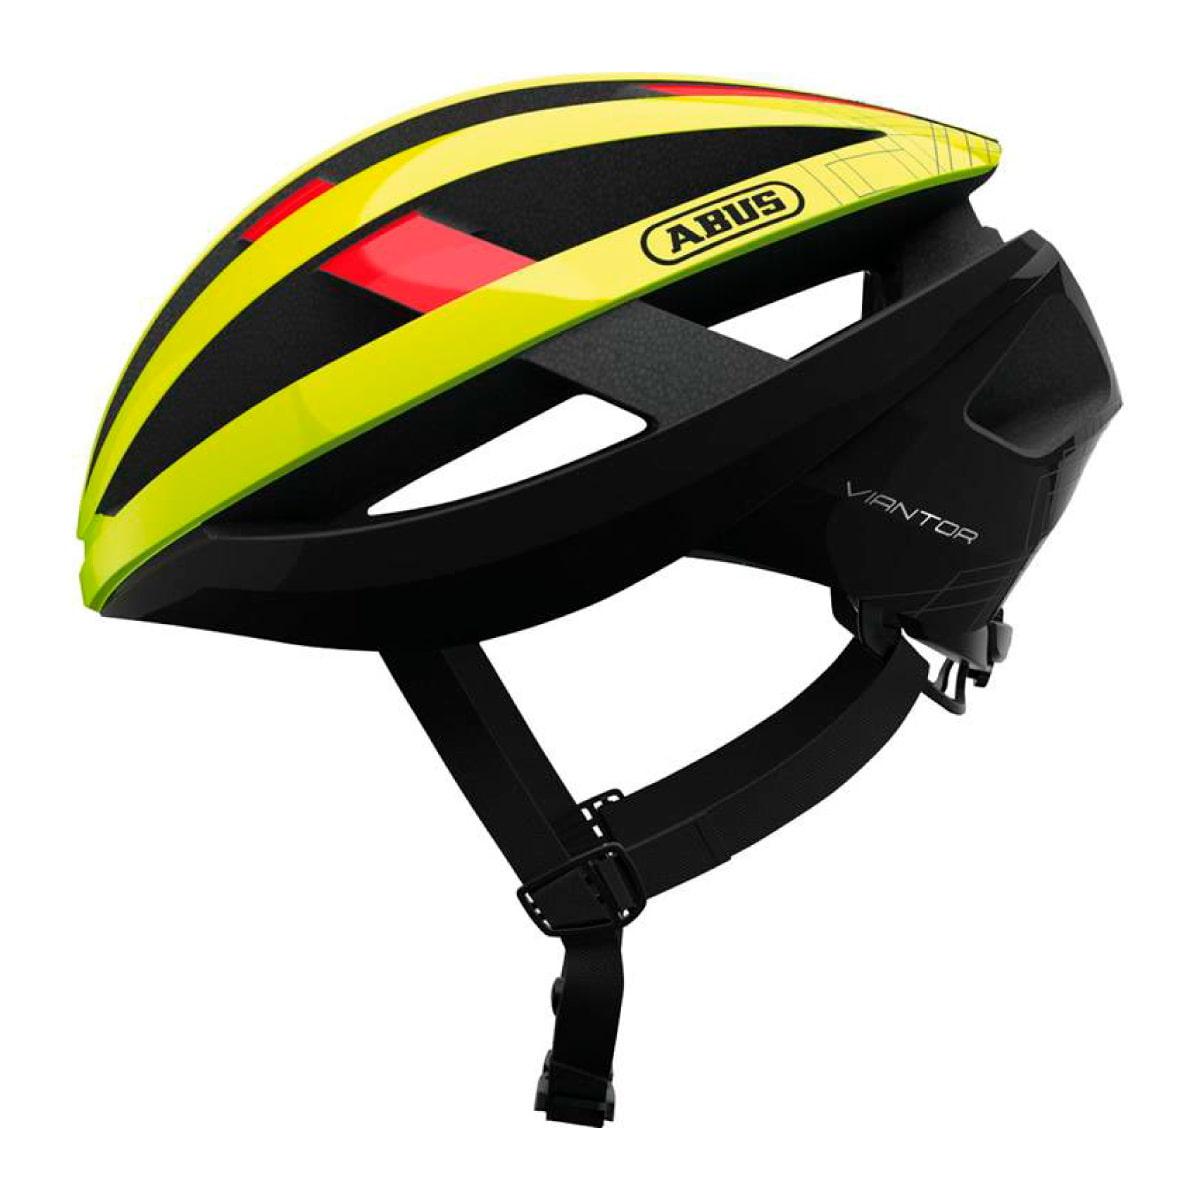 Capacete Ciclismo ABUS Viantor Amarelo E Preto